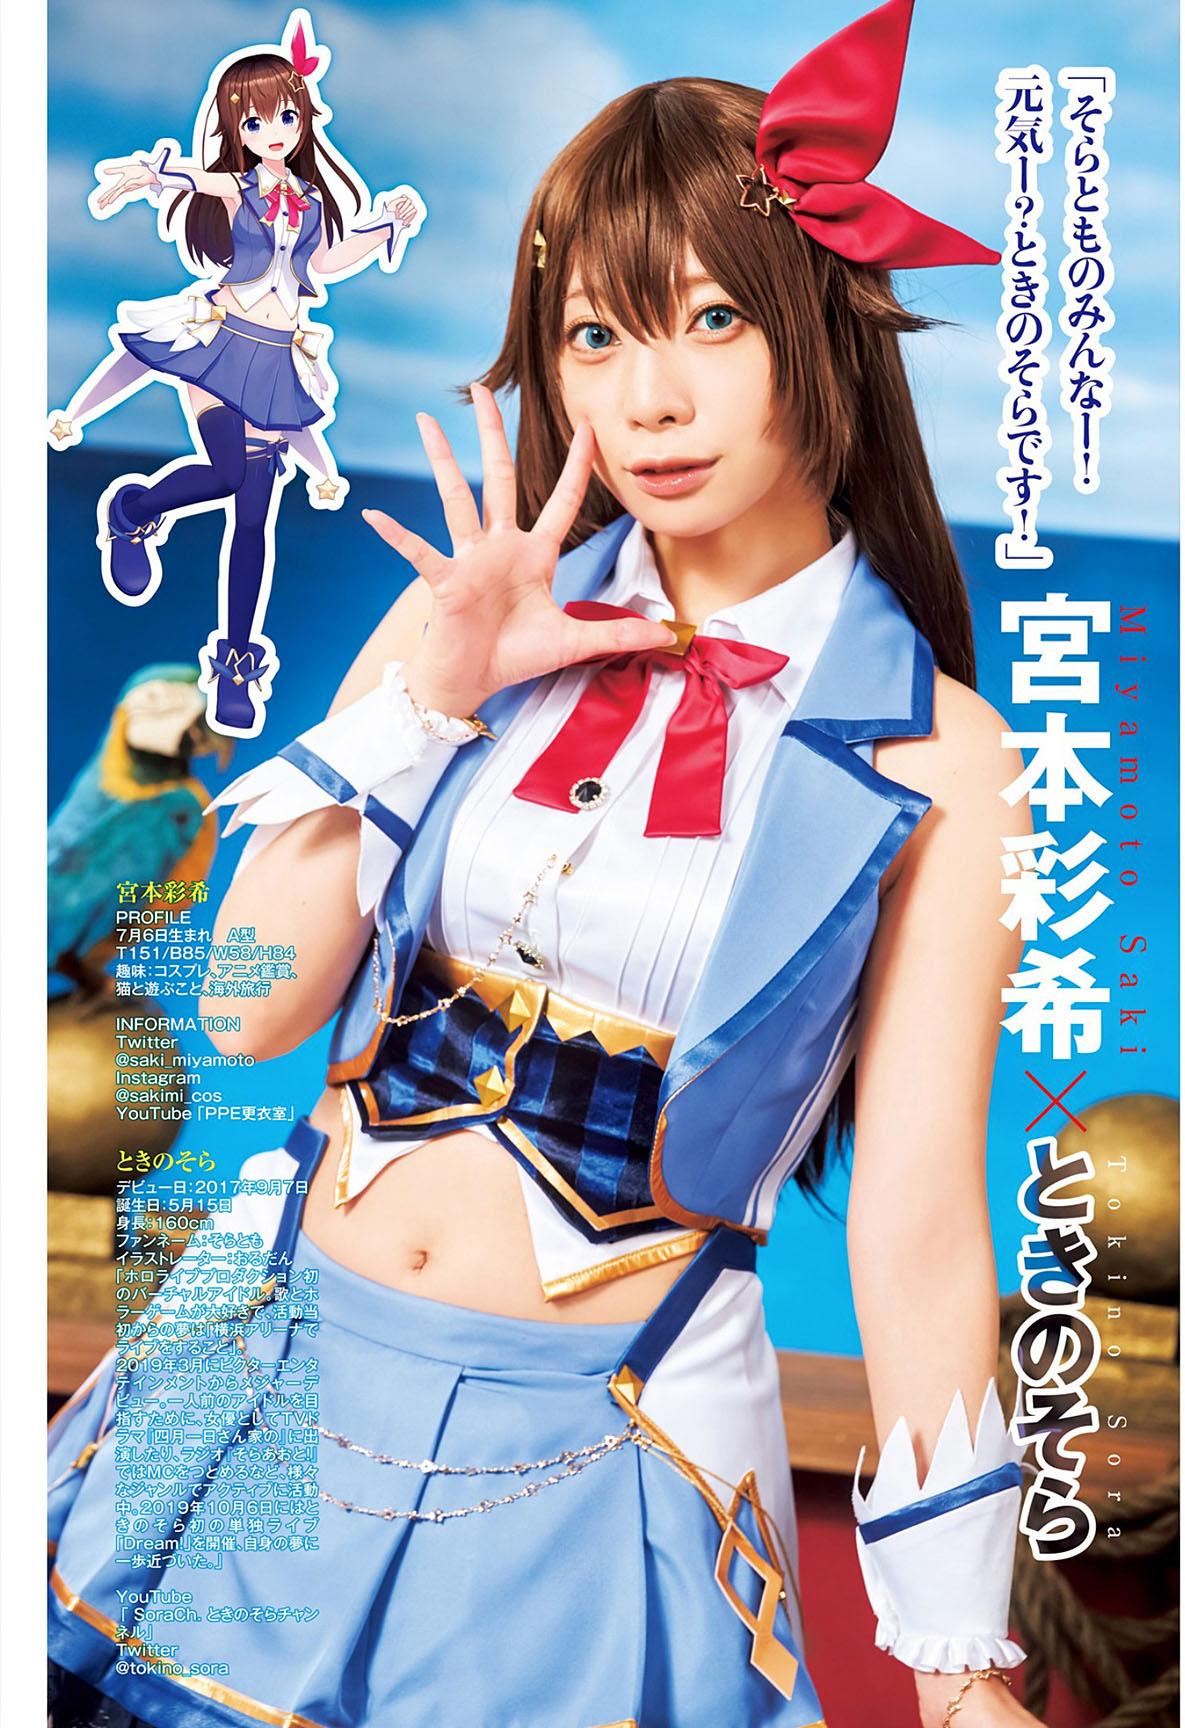 Enako Young Jump 210826 10.jpg